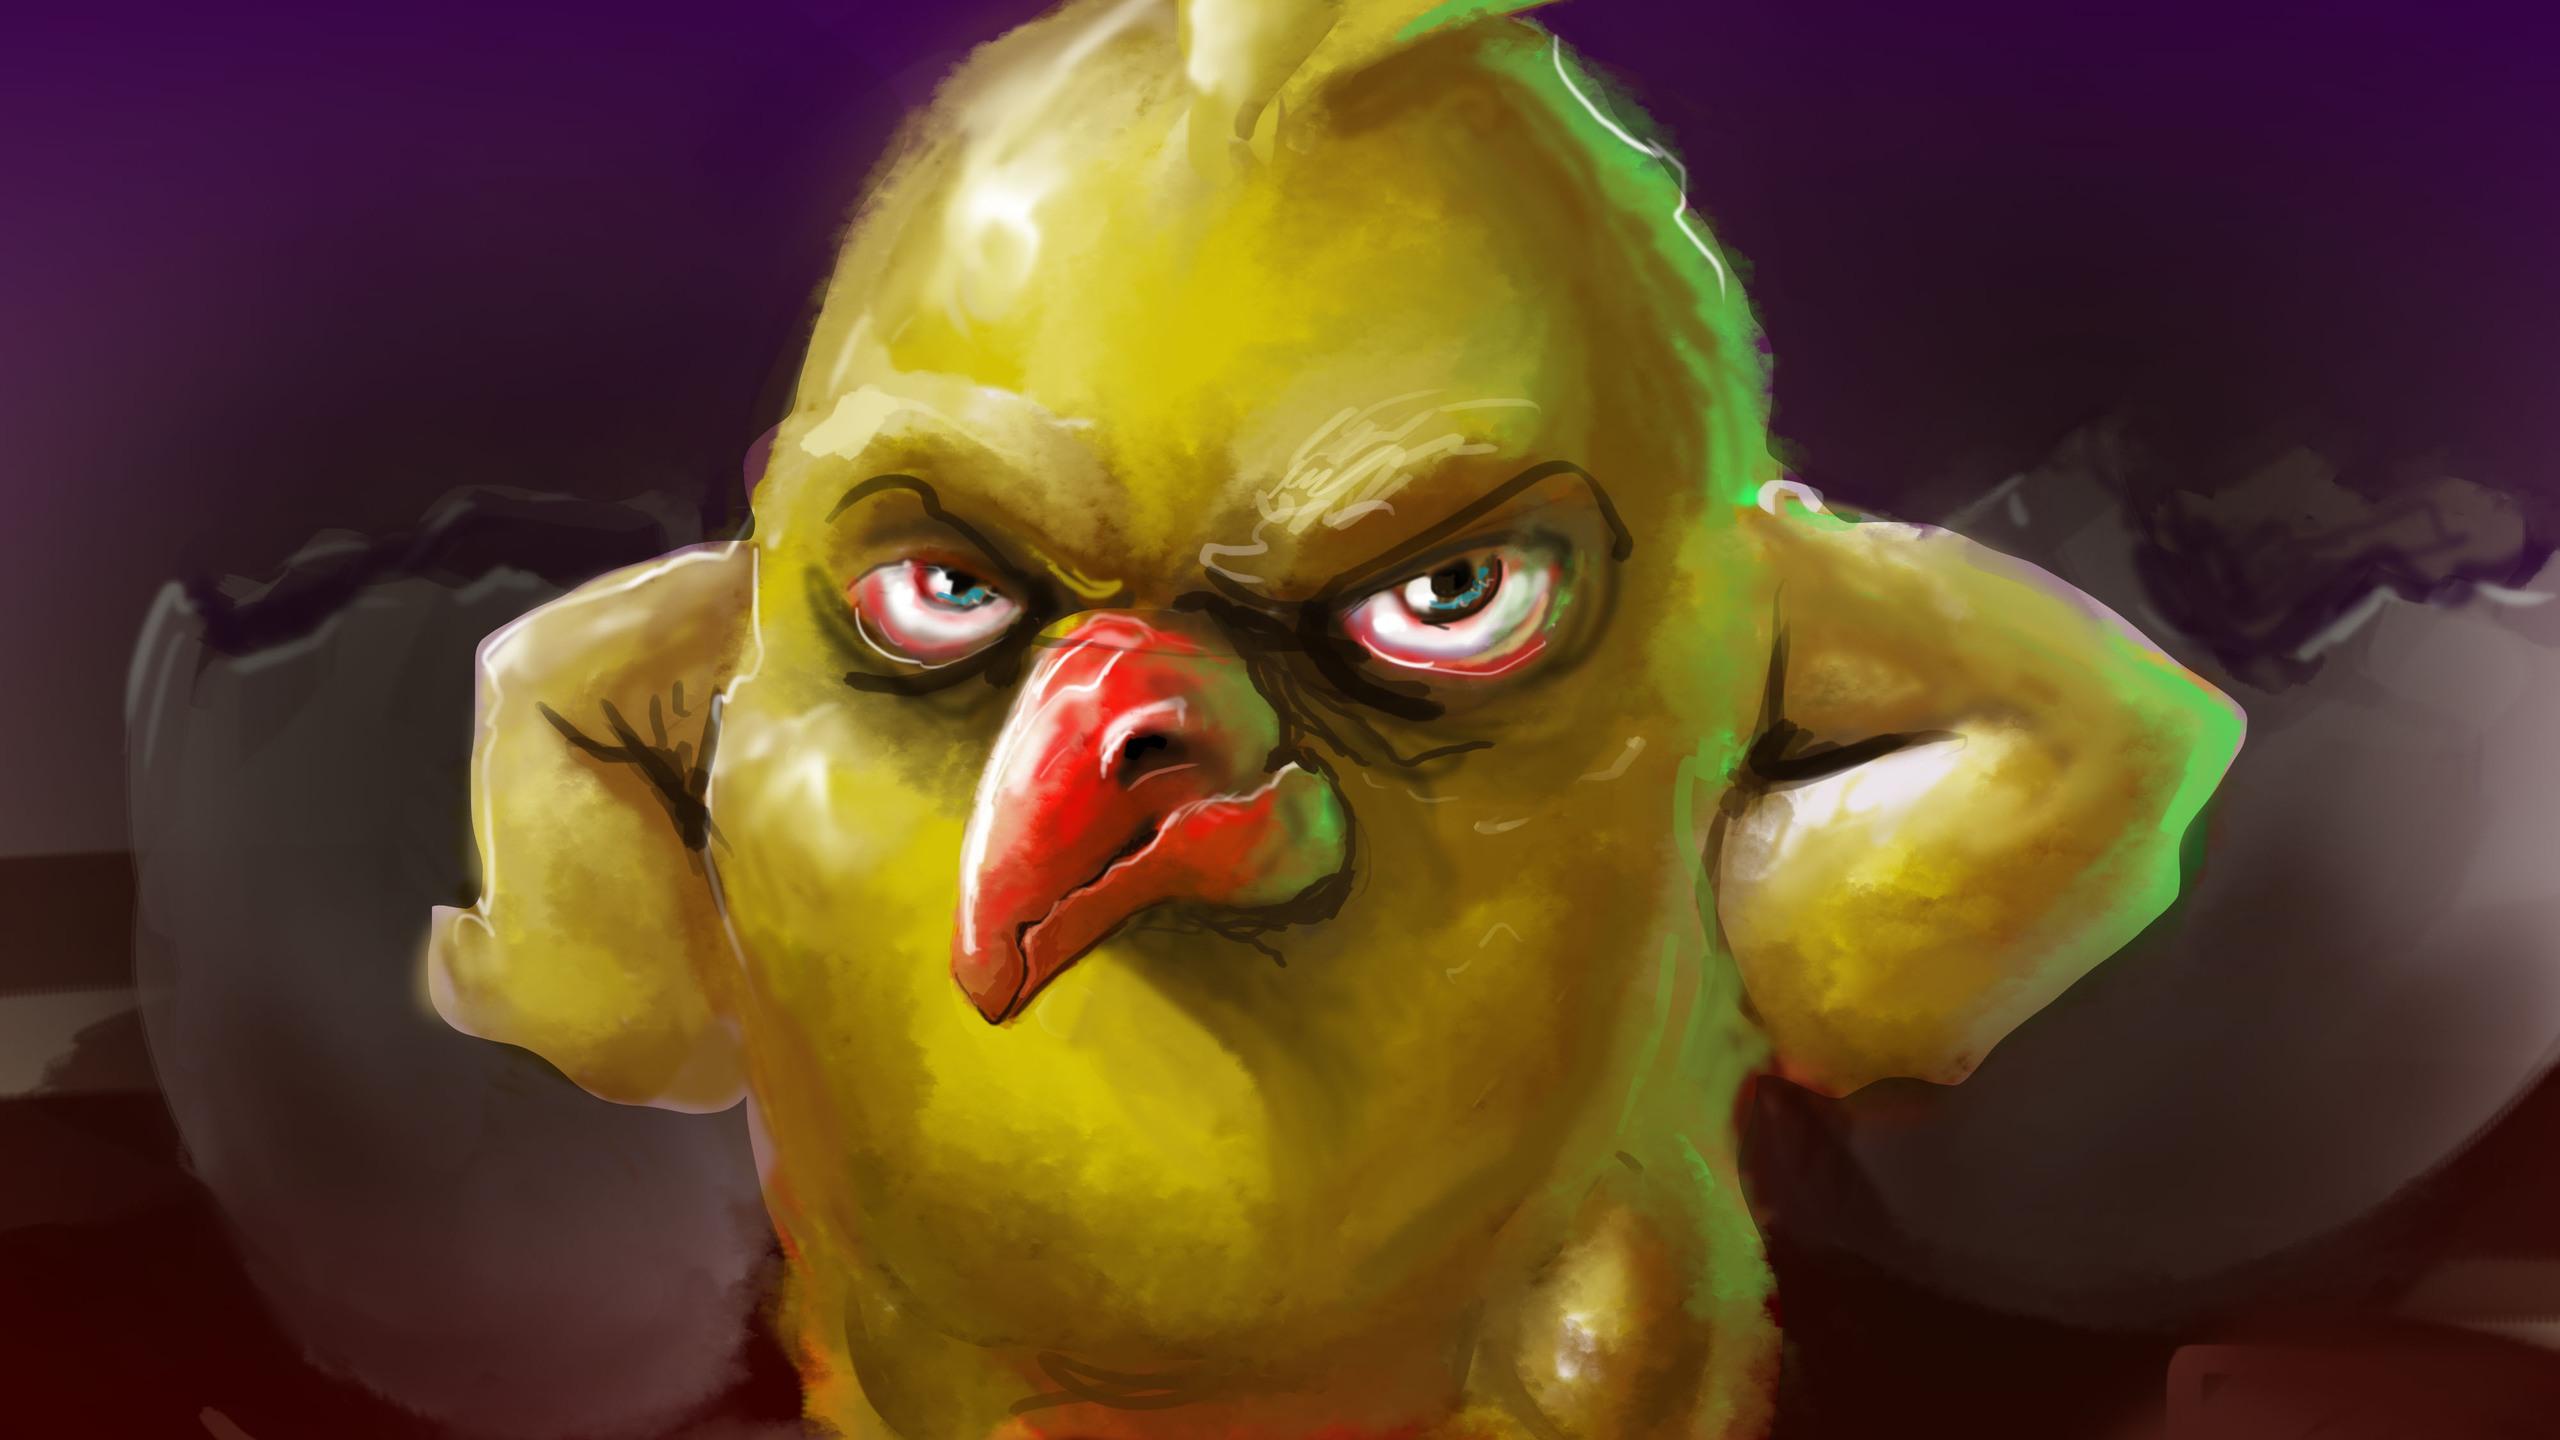 angry-bird-4k-artwork-j2.jpg